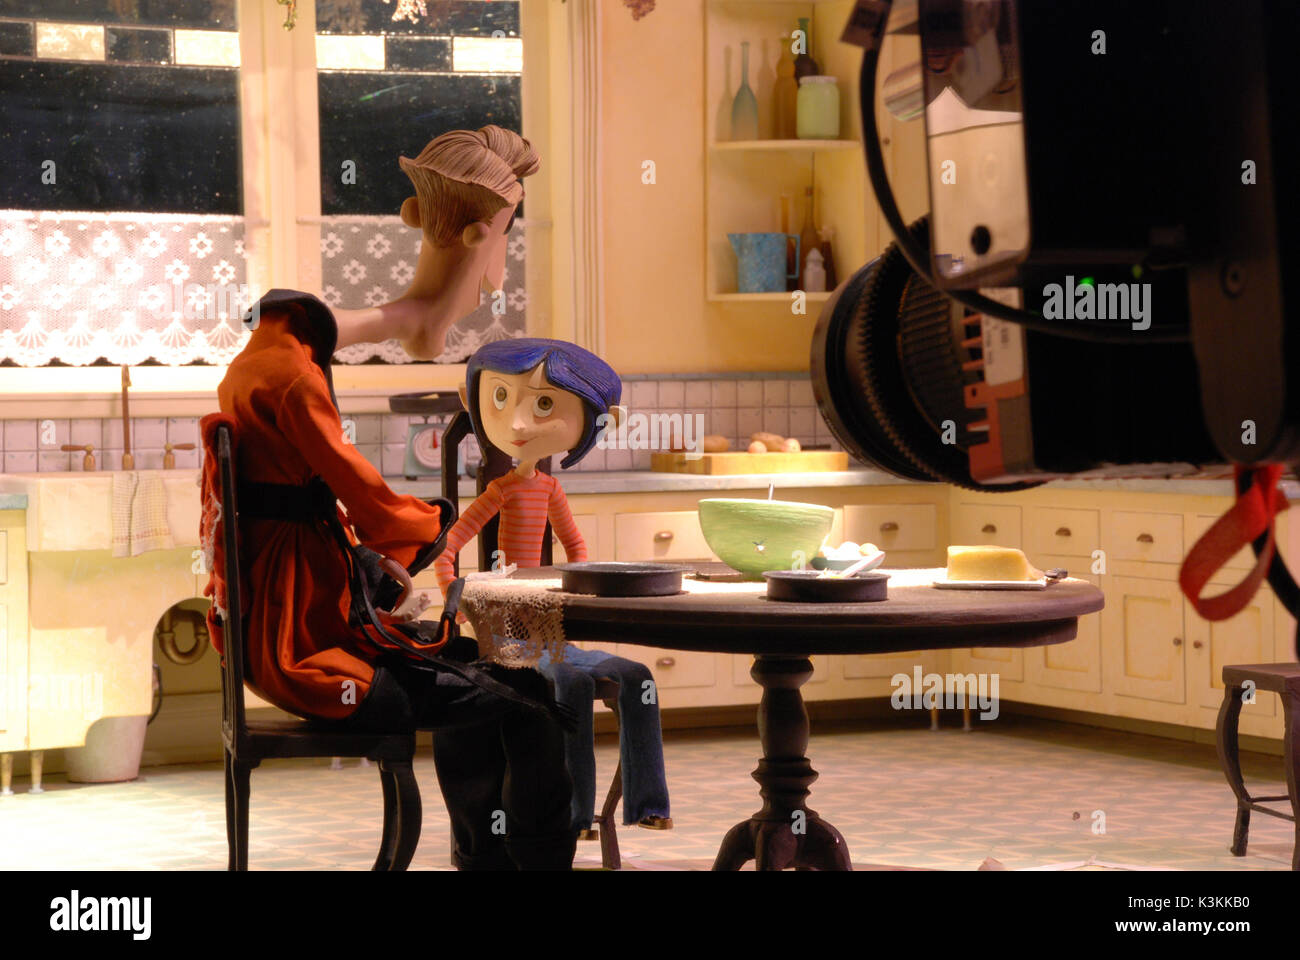 Coraline Stockfotos & Coraline Bilder - Alamy